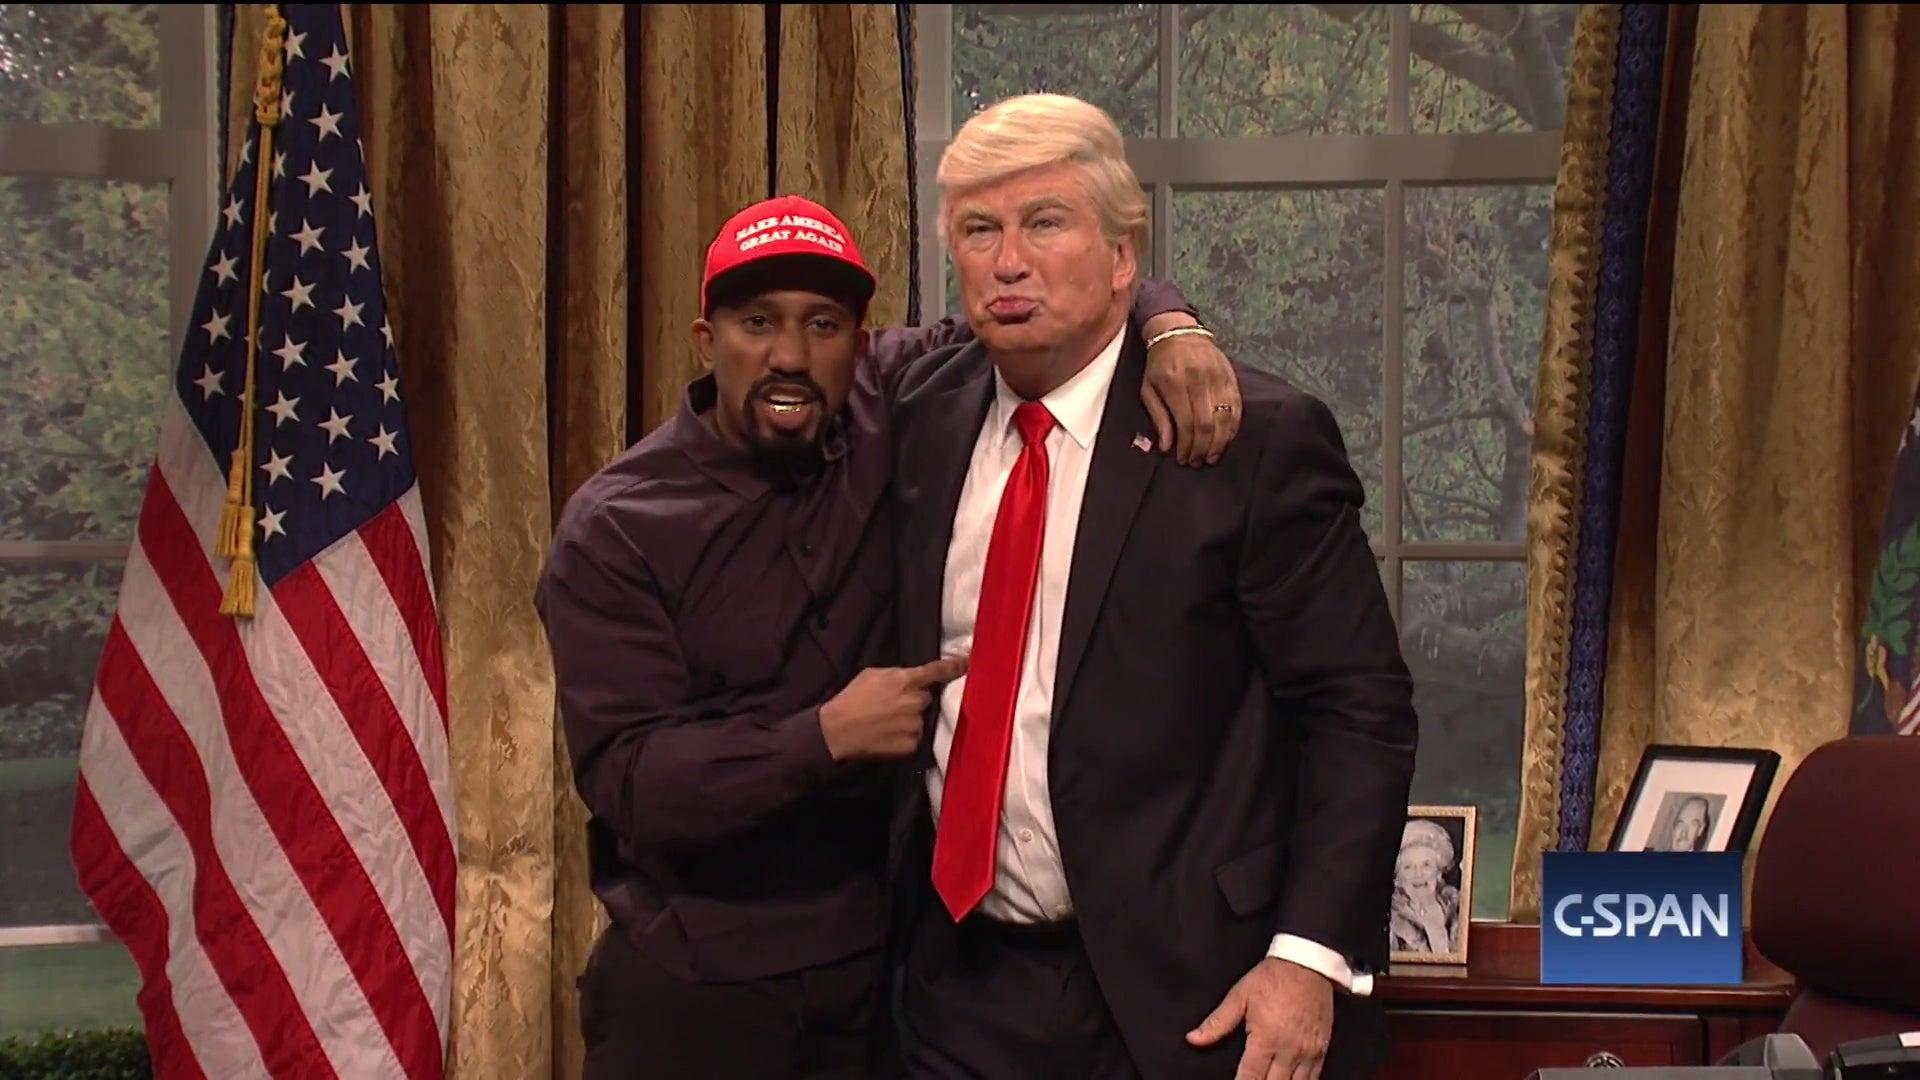 Chris Redd, dressed as Kanye West, embraces Alec Baldwin, dressed as Donald Trump.